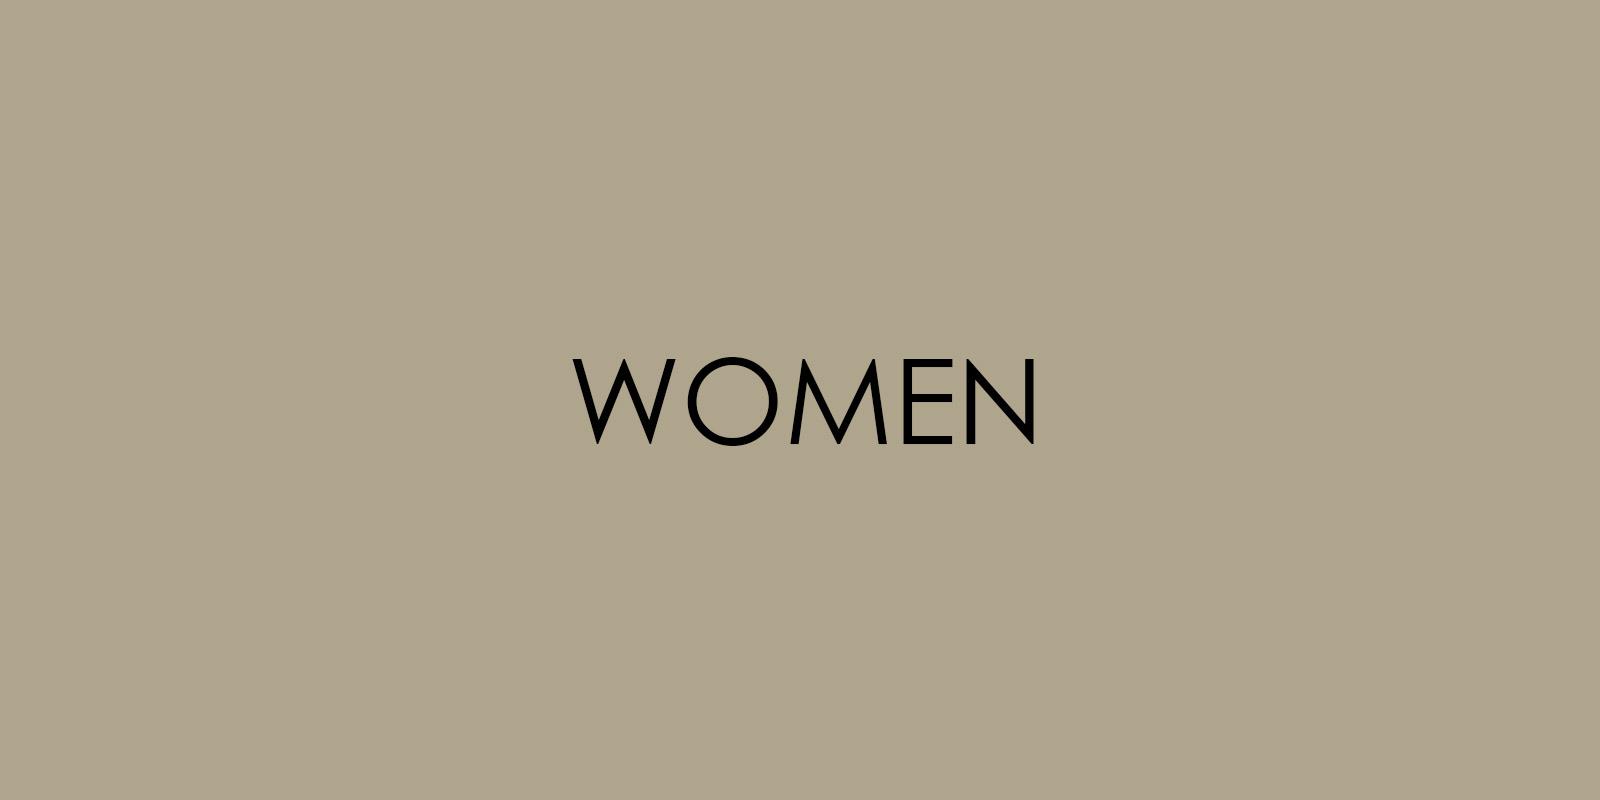 media/image/womenD1okas1eaOK0a.jpg